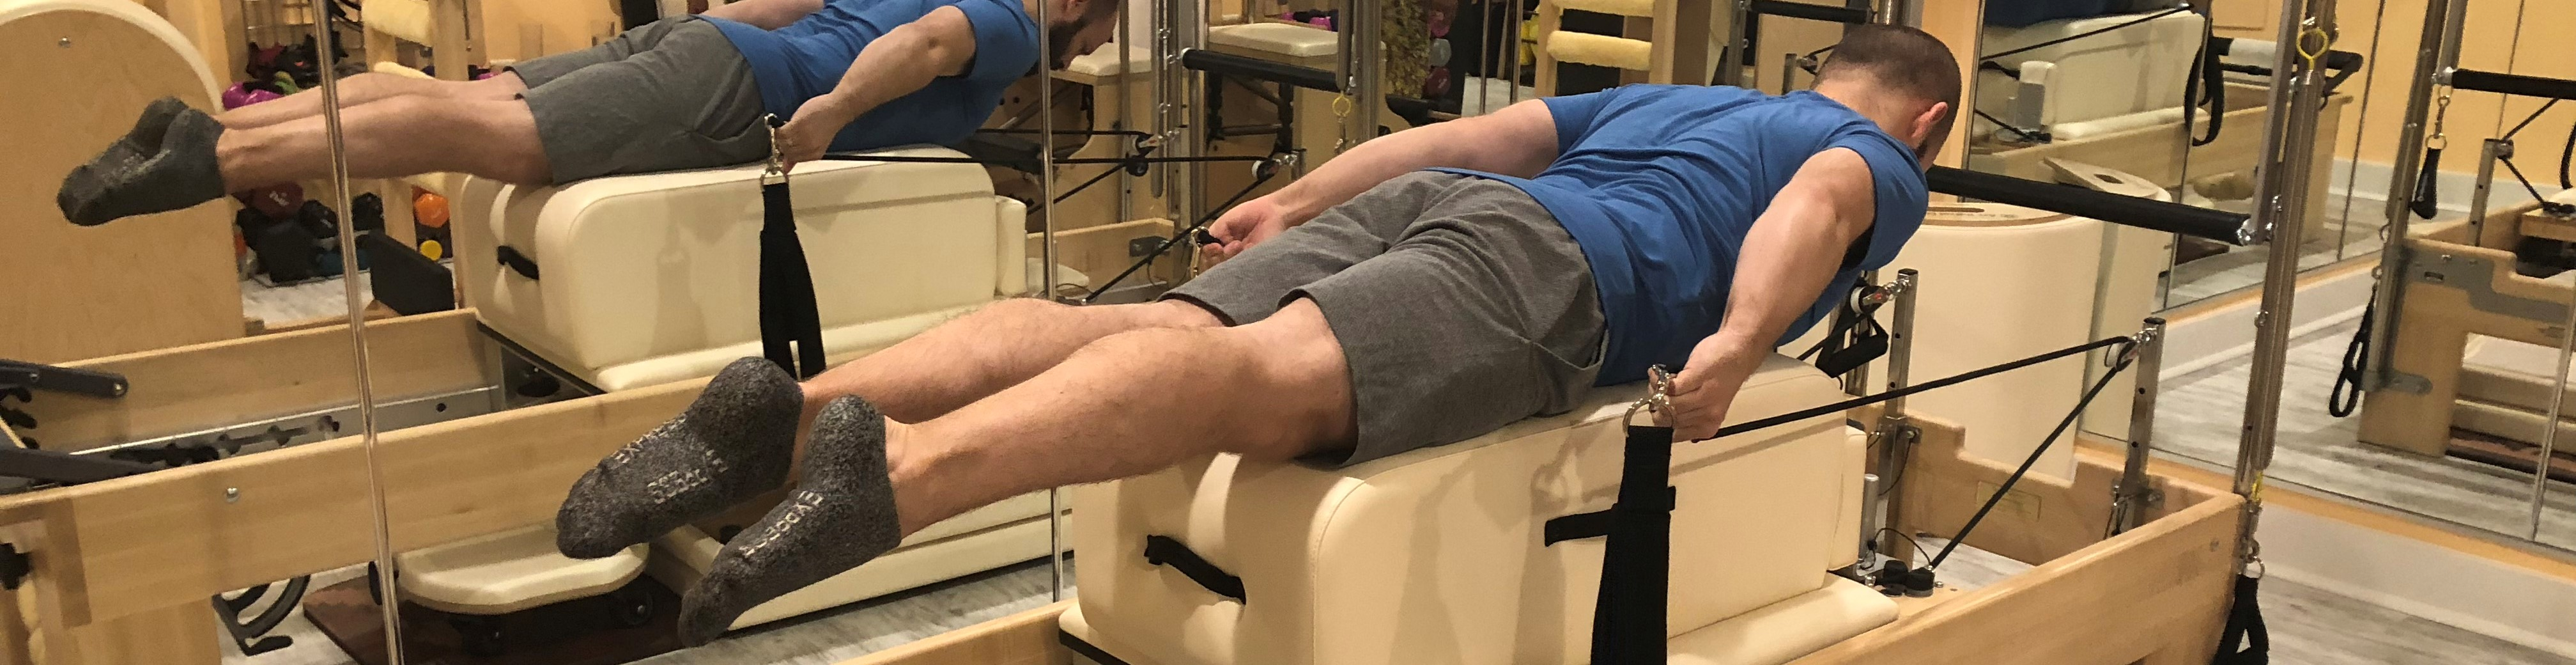 Prone Stretching